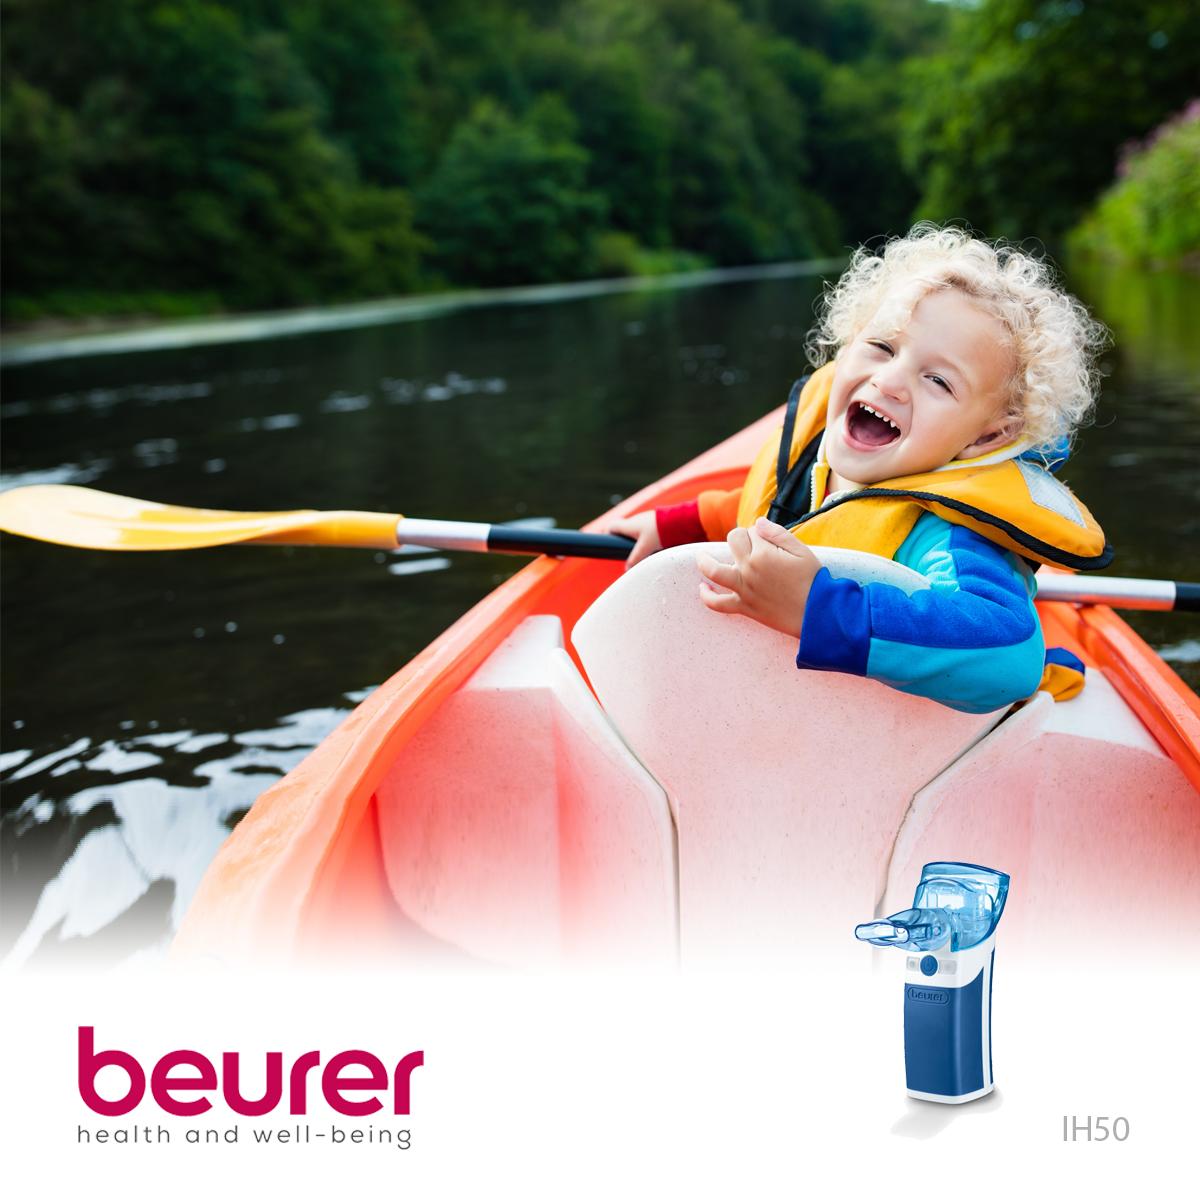 Beurer Malta product 02